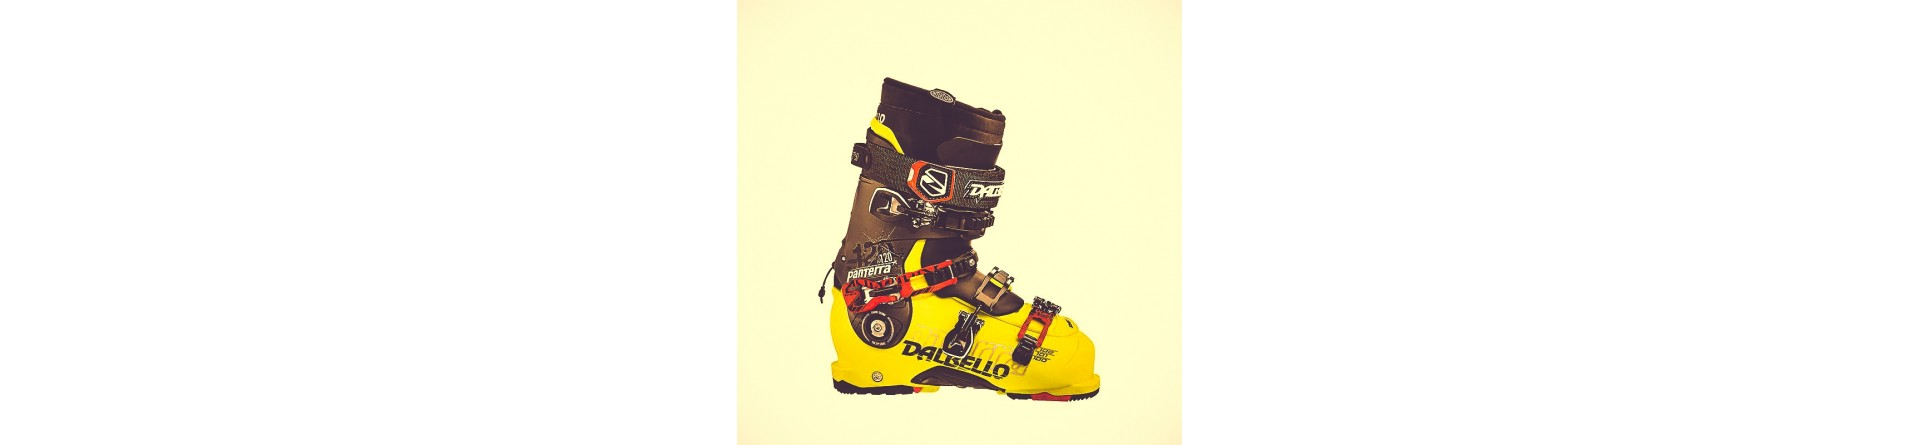 Scarponi Sci Alpino | Giuglar Shop